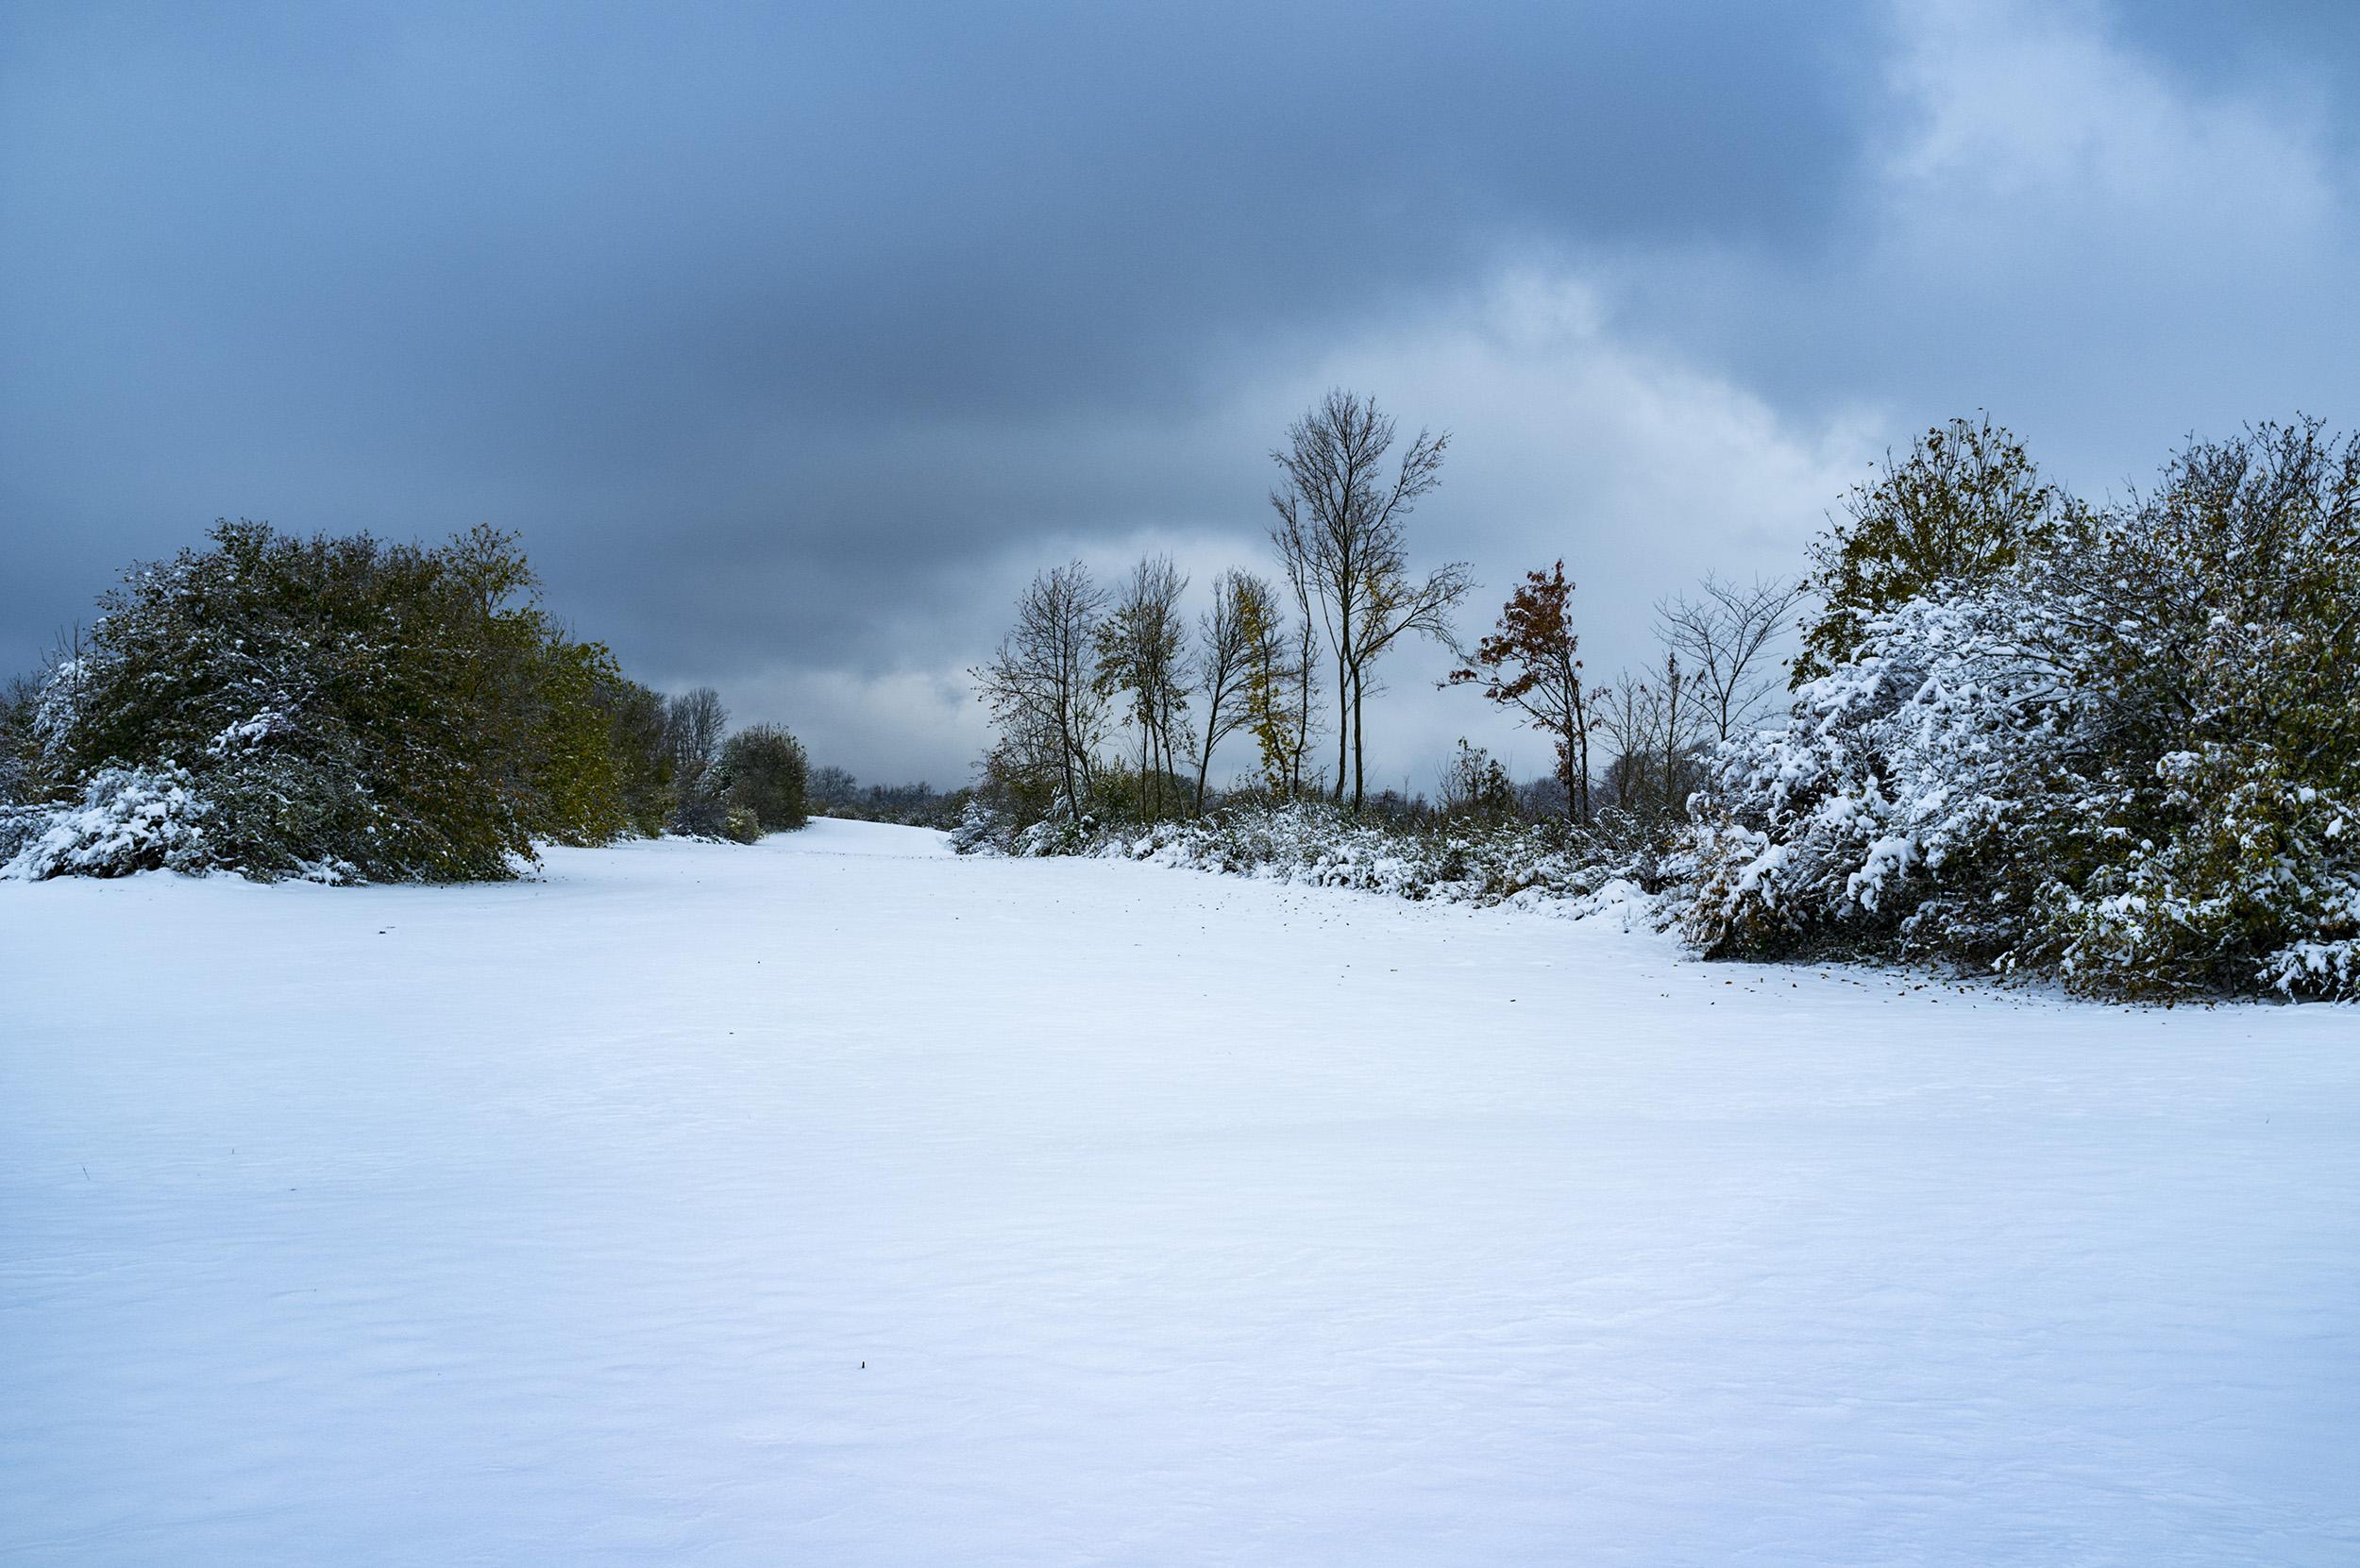 Winter - Landschaftsfotografie